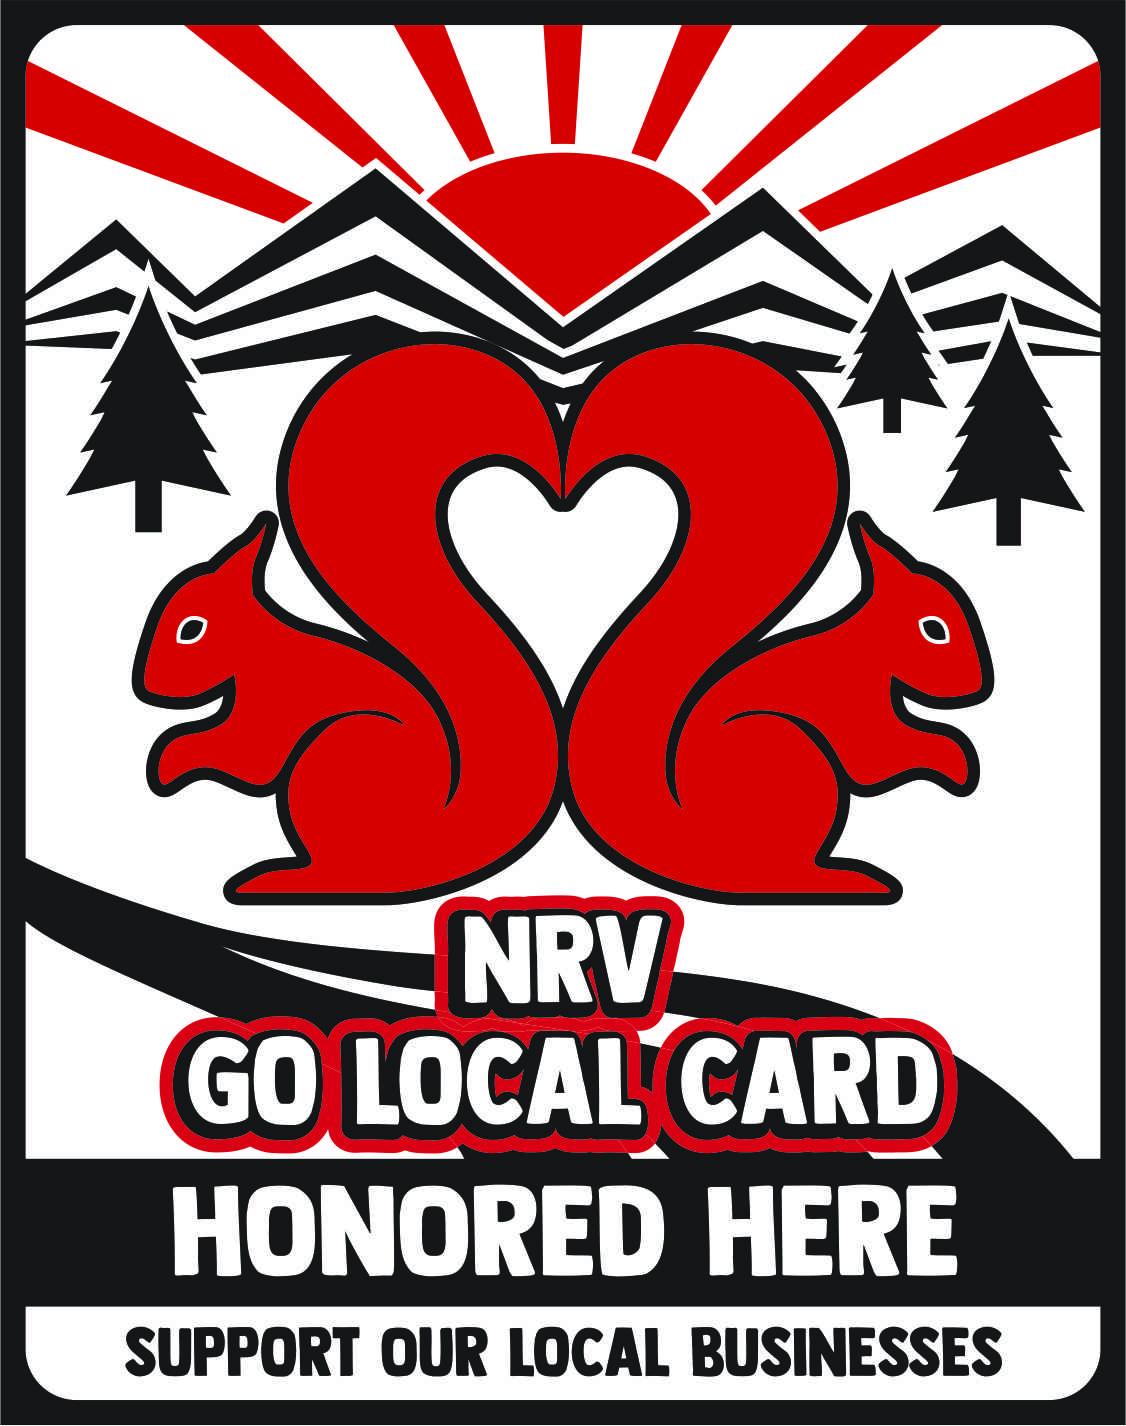 NRV Homegrown artwork by  Exper-T's Blacksburg